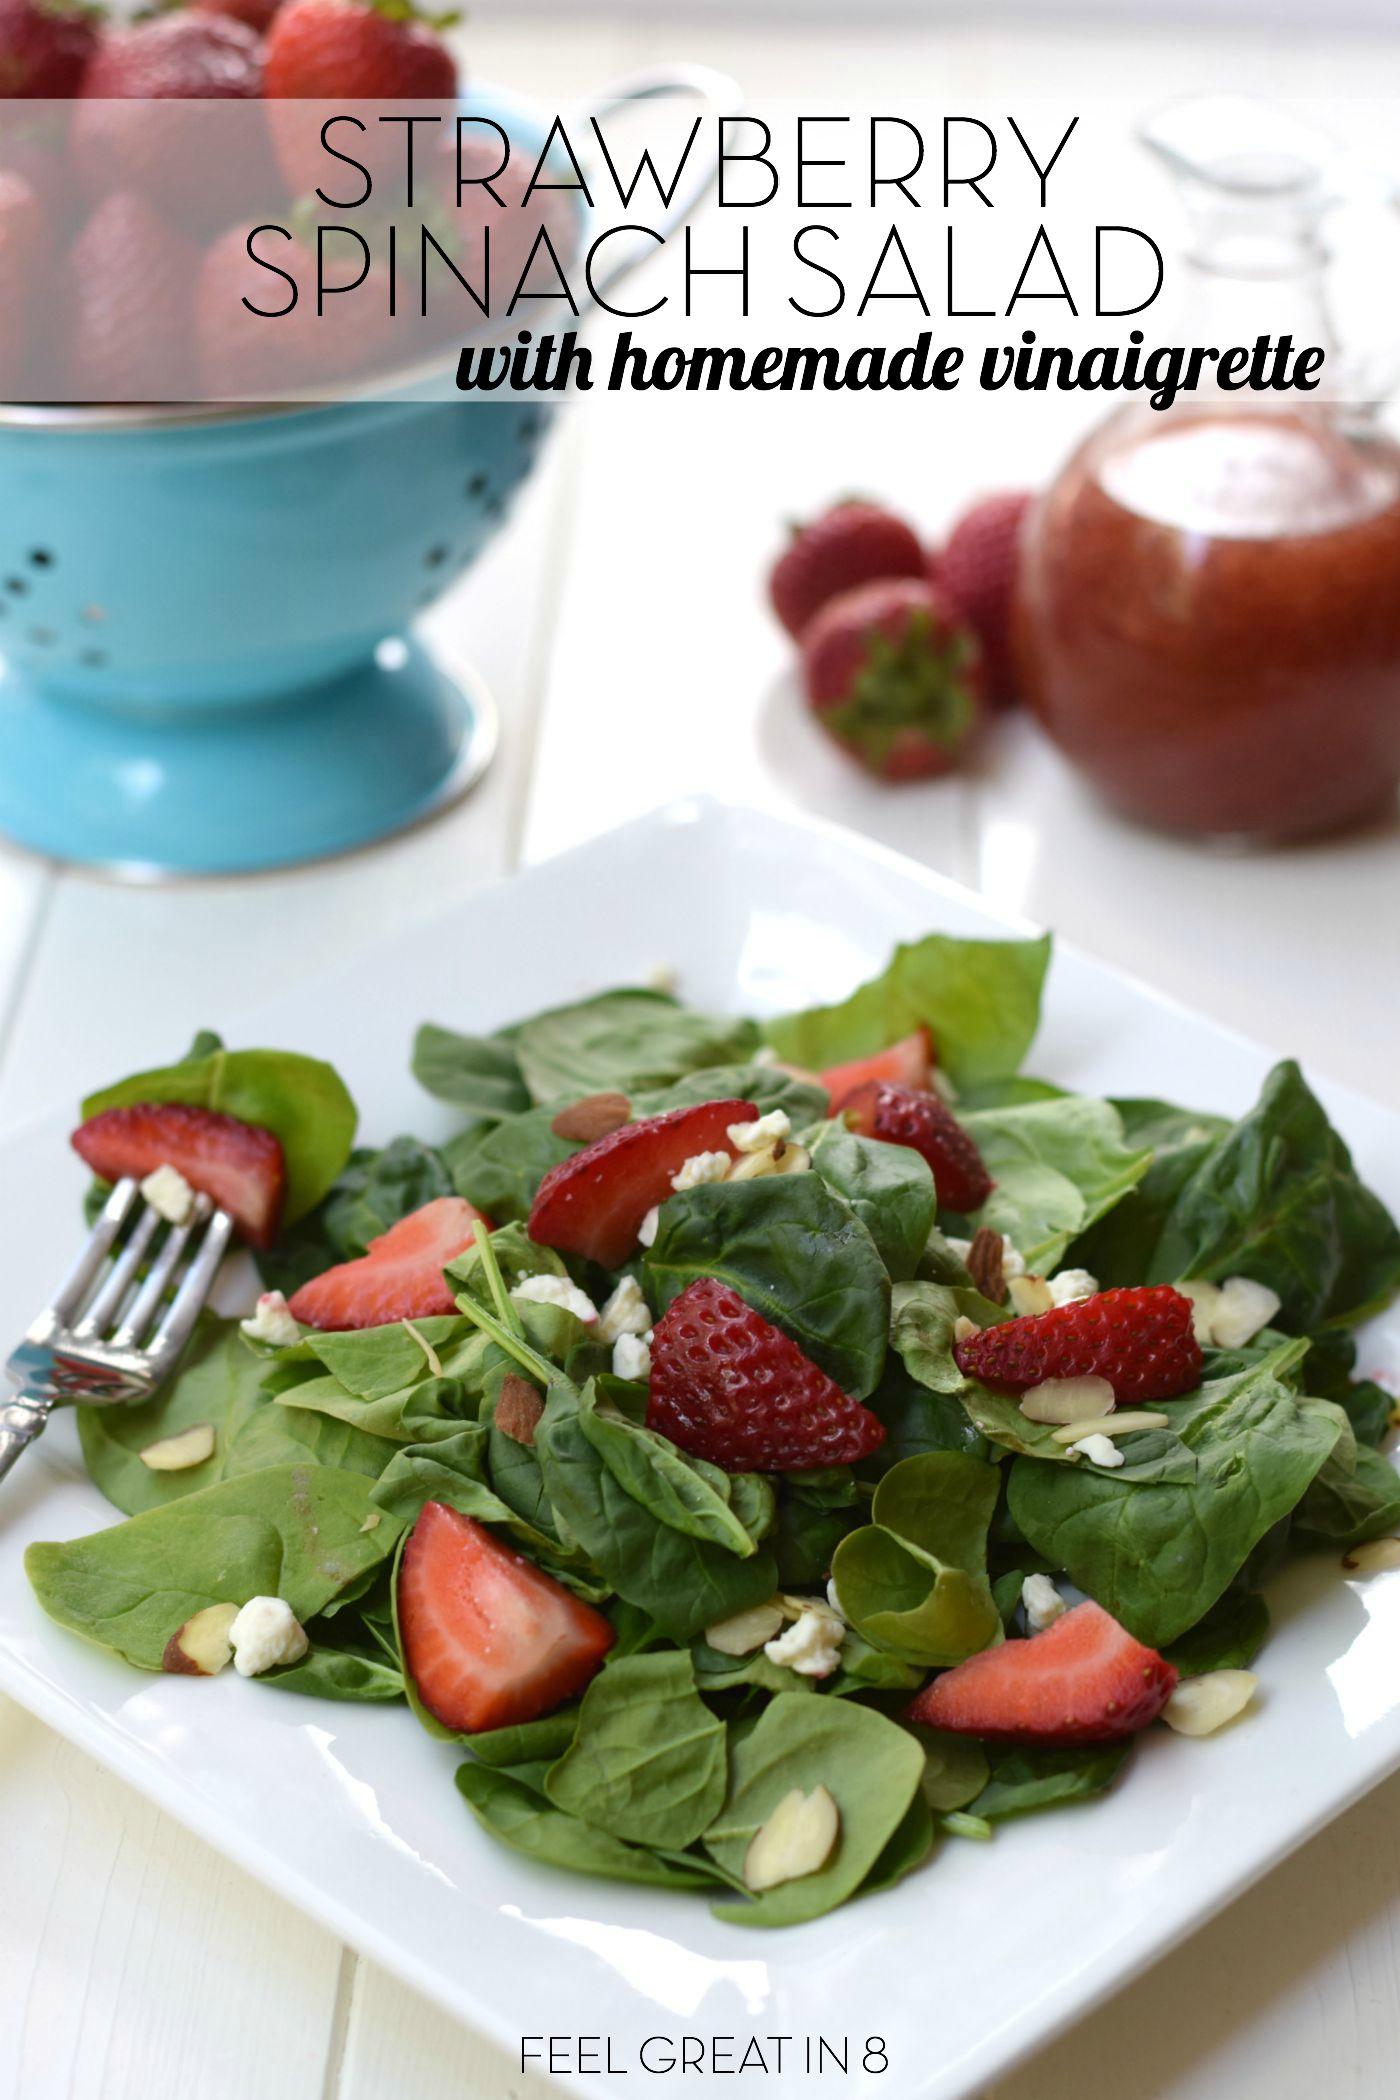 Simple Dinner Party Menu Ideas Part - 32: Charming Simple Dinner Party Menu For 8 Part - 9: Strawberry Spinach Salad